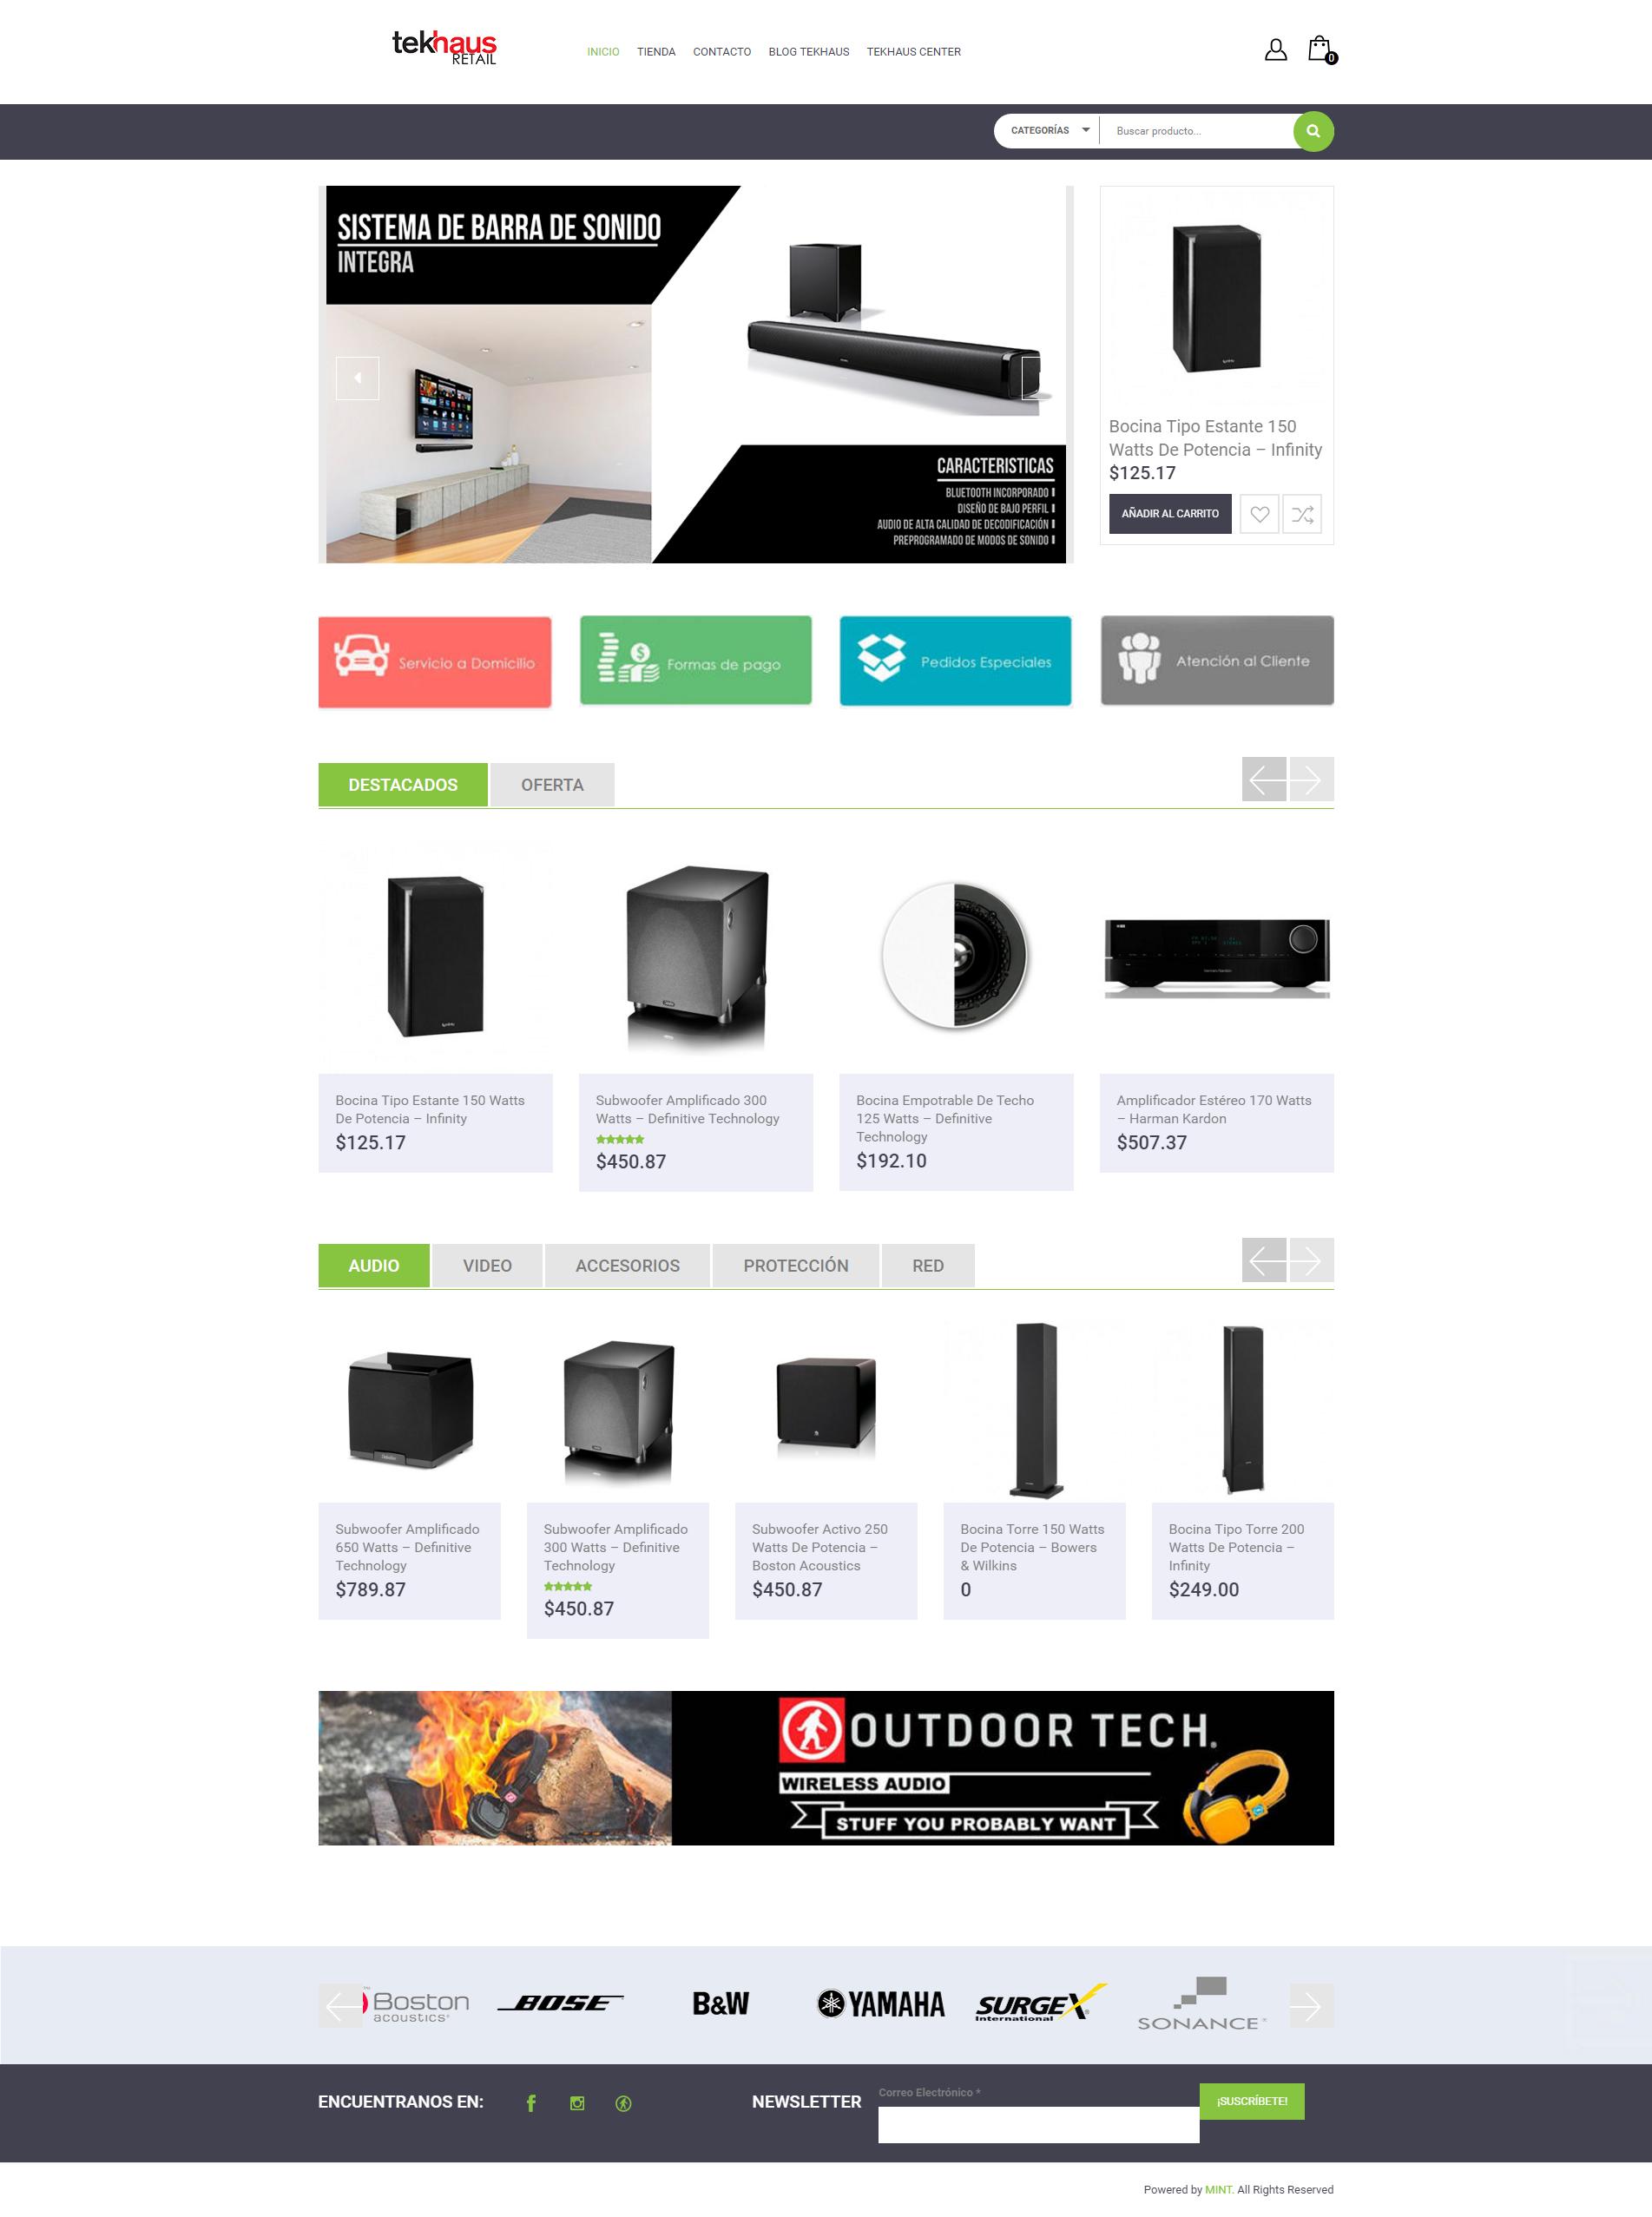 Tekhaus website - Store